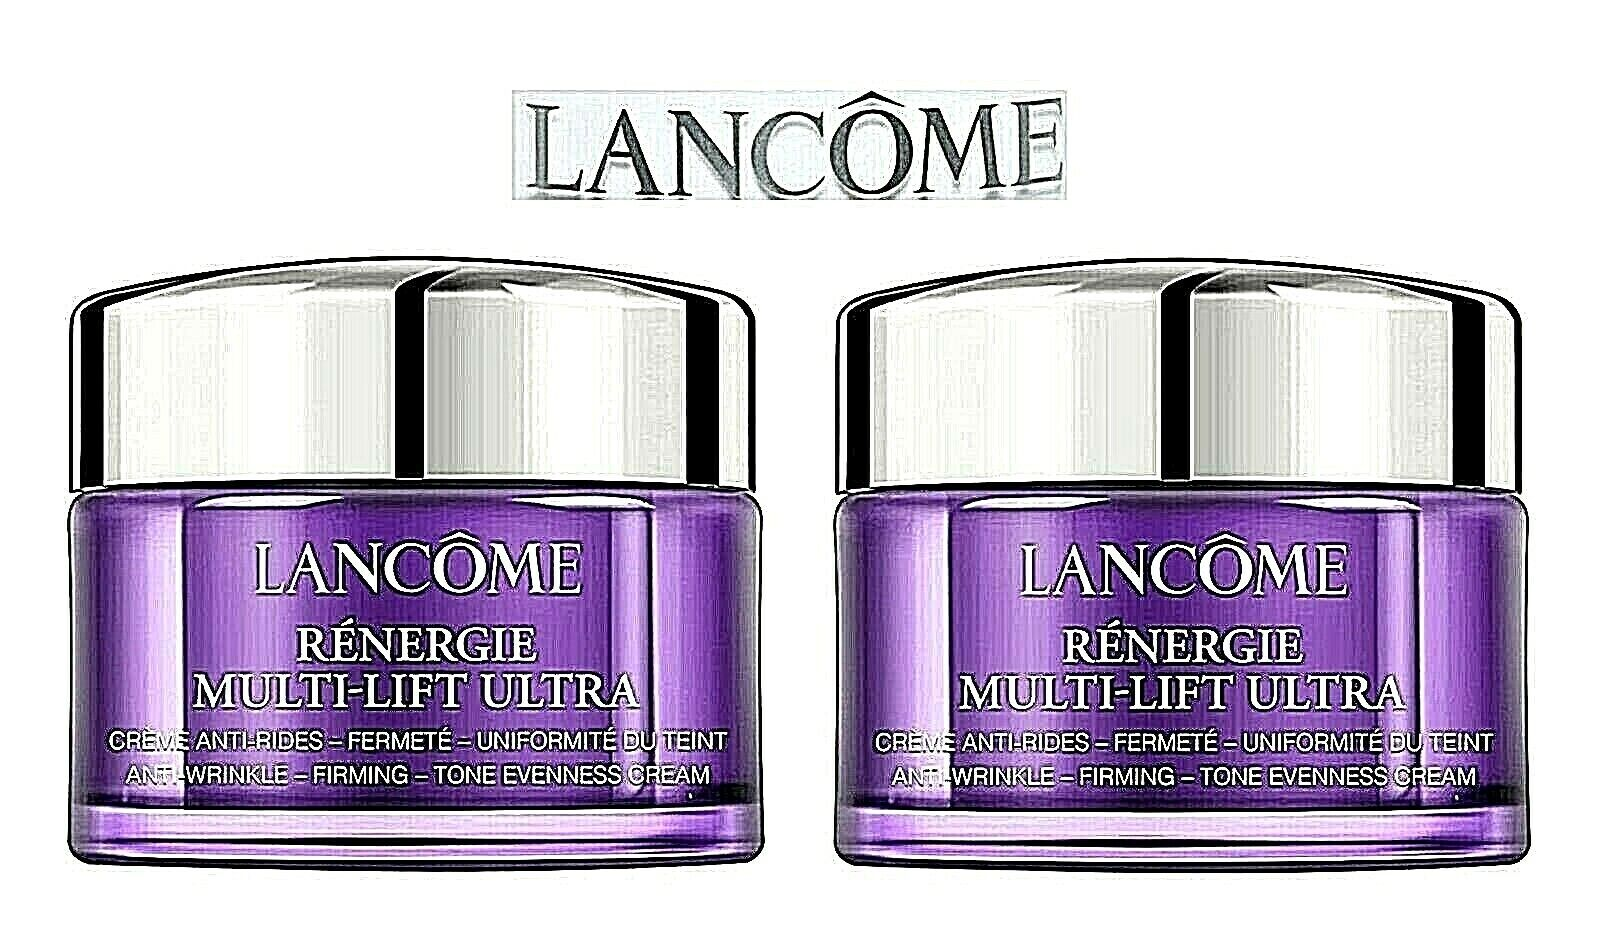 Lancome Renergie Multi-Lift ULTRA 30 ml Anti Wrinkle Cream Neu ( 2 x 15 ml )